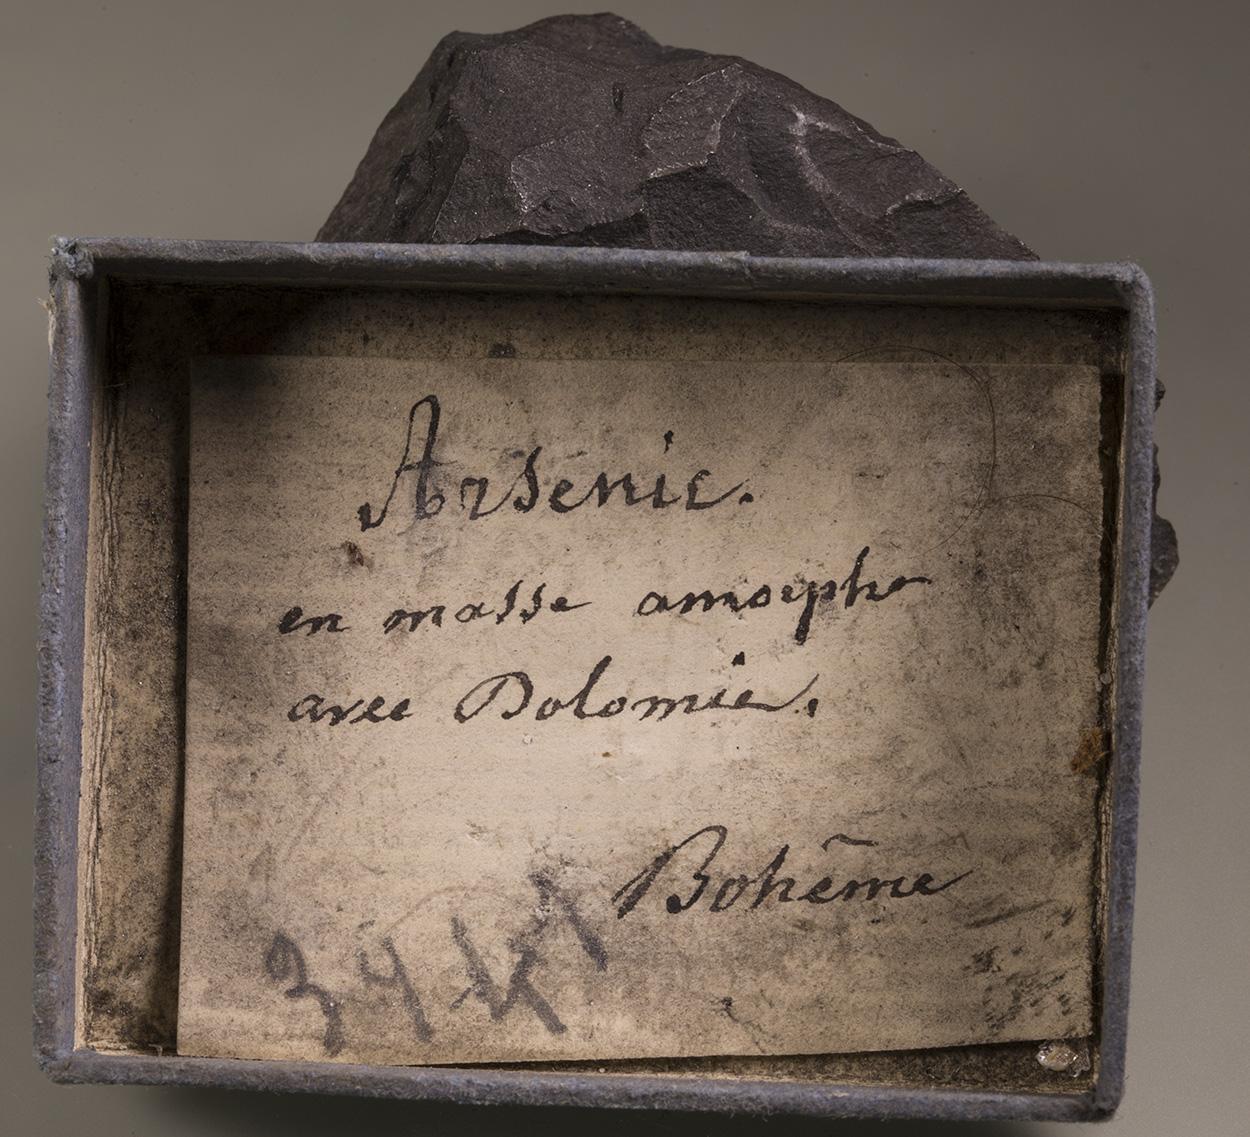 Arsenic & Dolomite